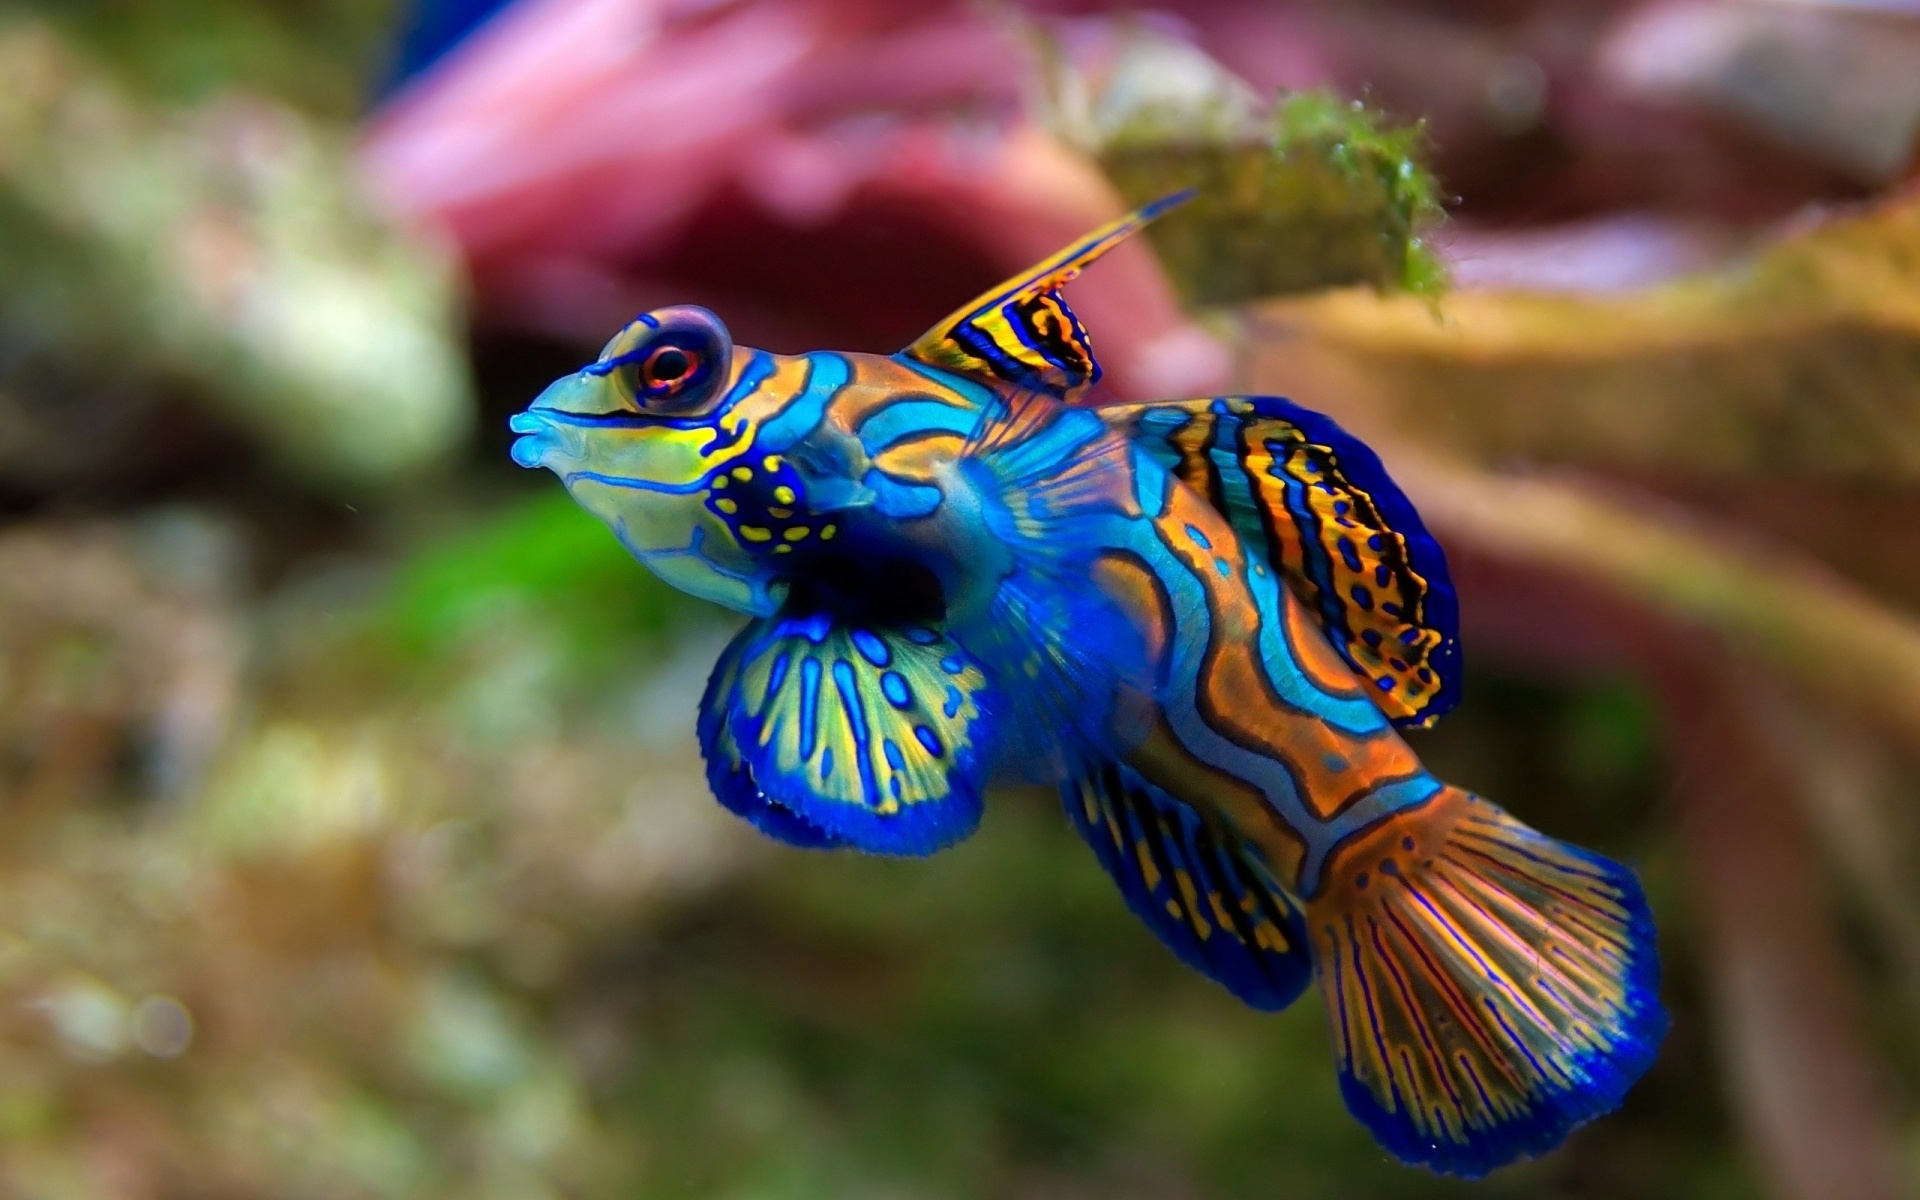 Tropical Fish Nocturnal Mirage Wallpaper 37596619 Fanpop